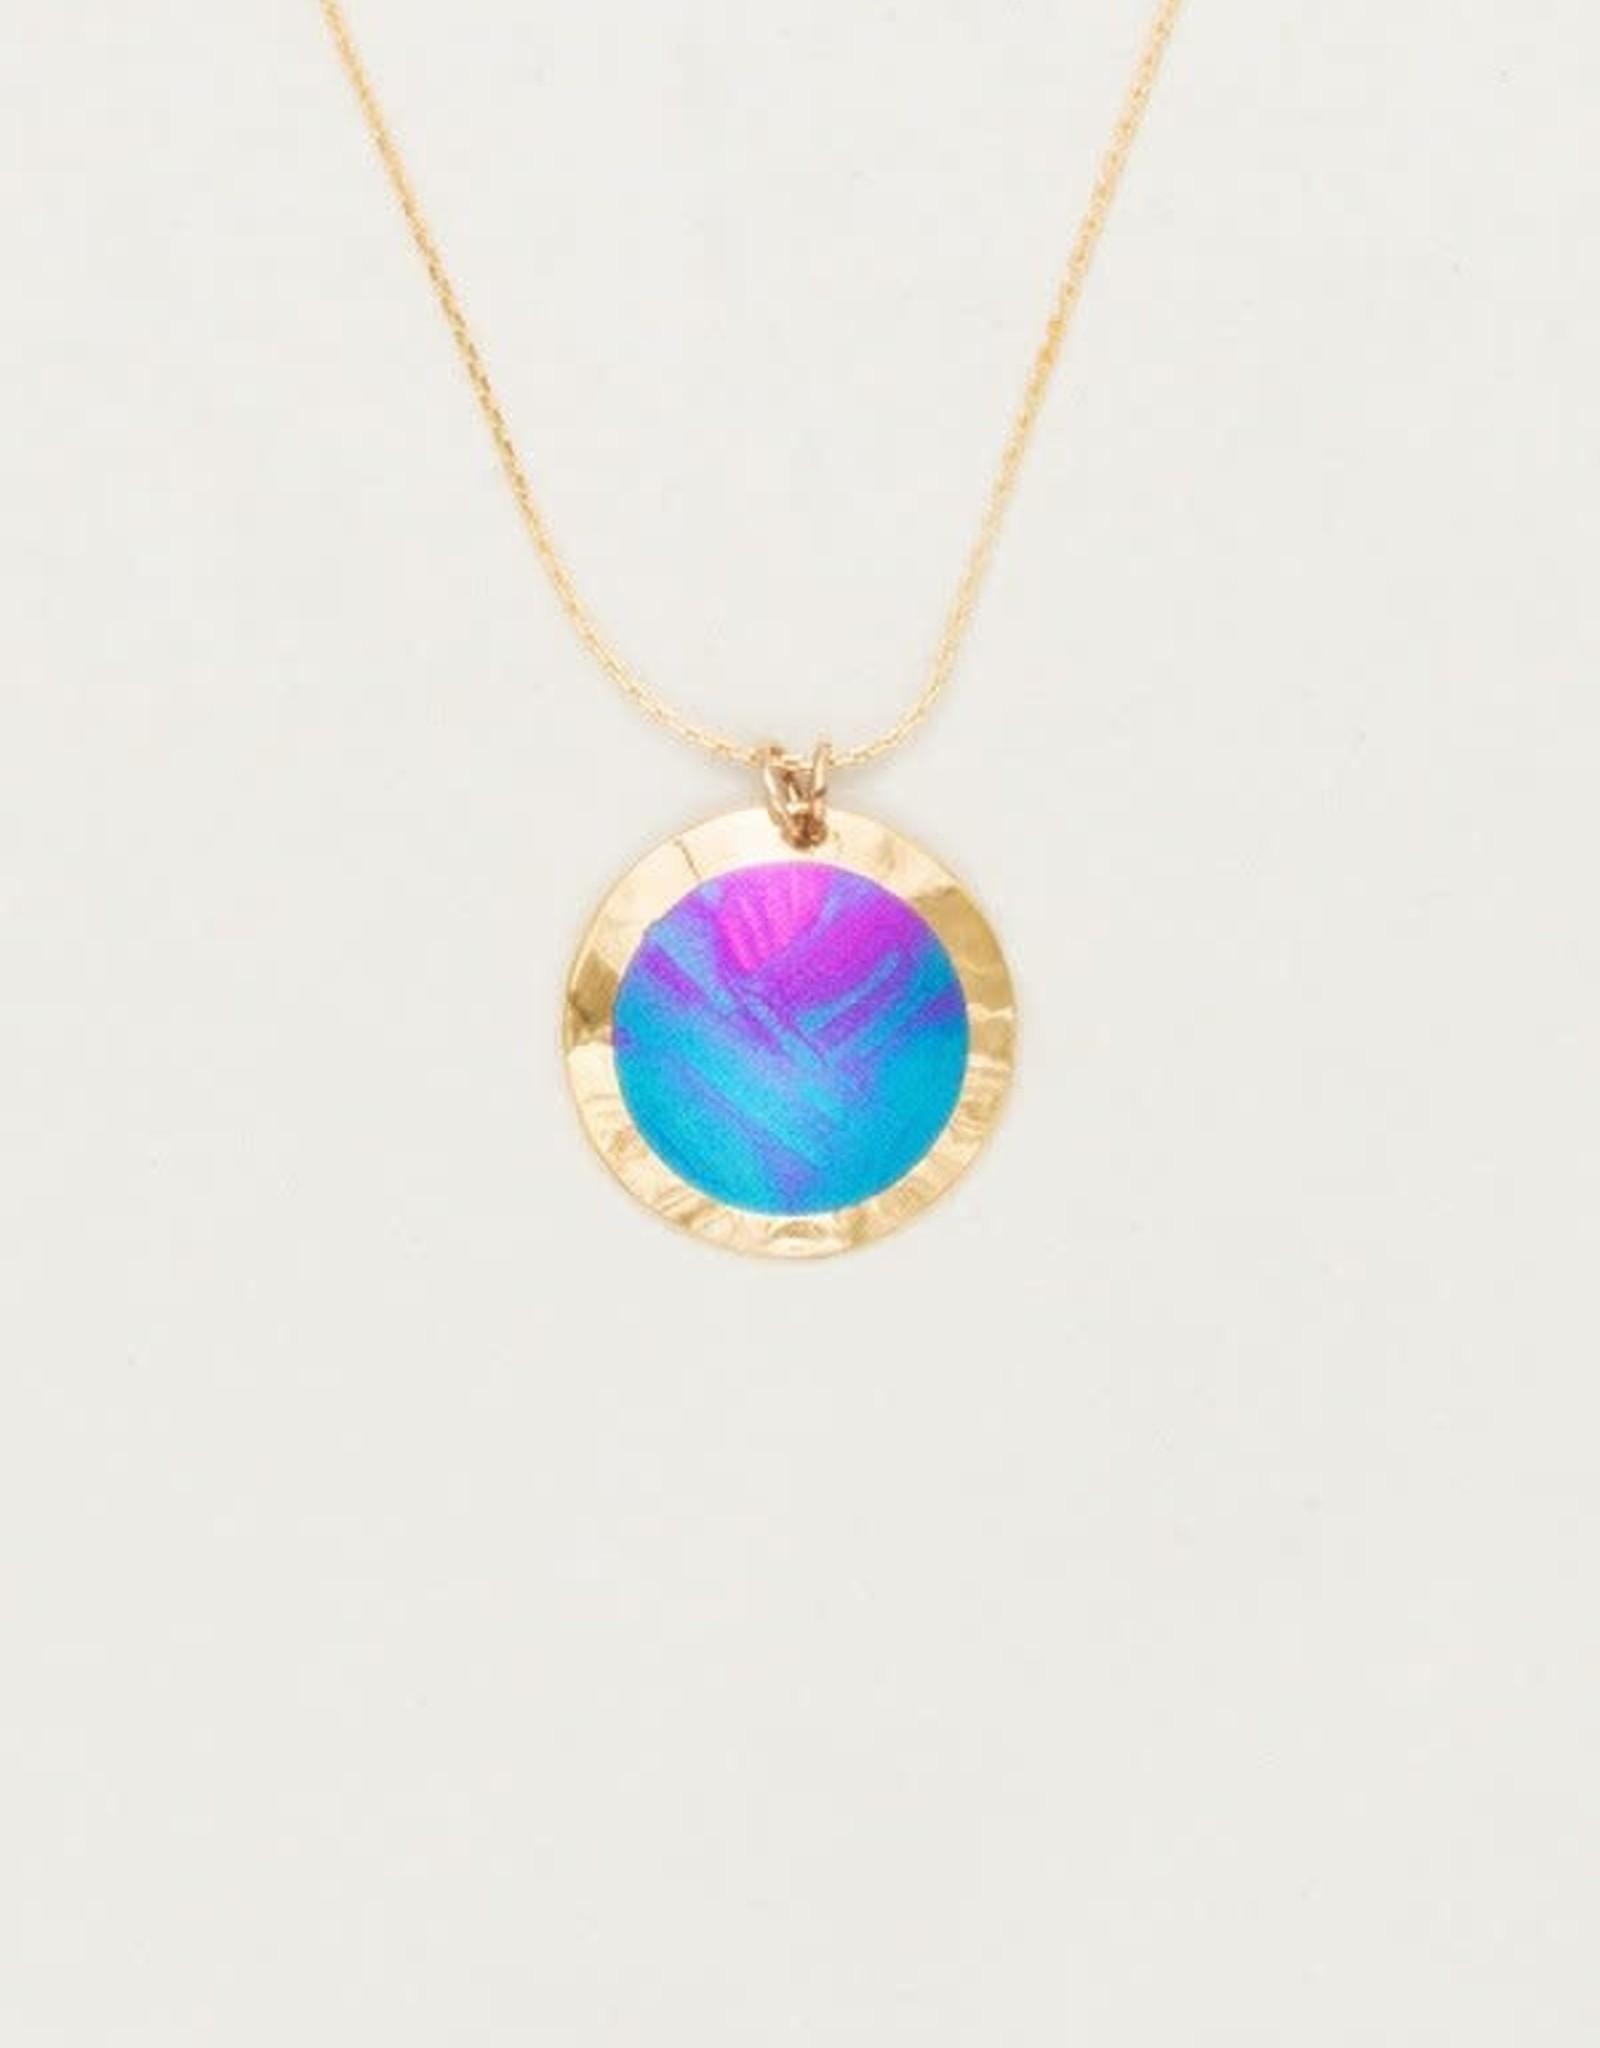 Holly Yashi Calypso Themla Necklace